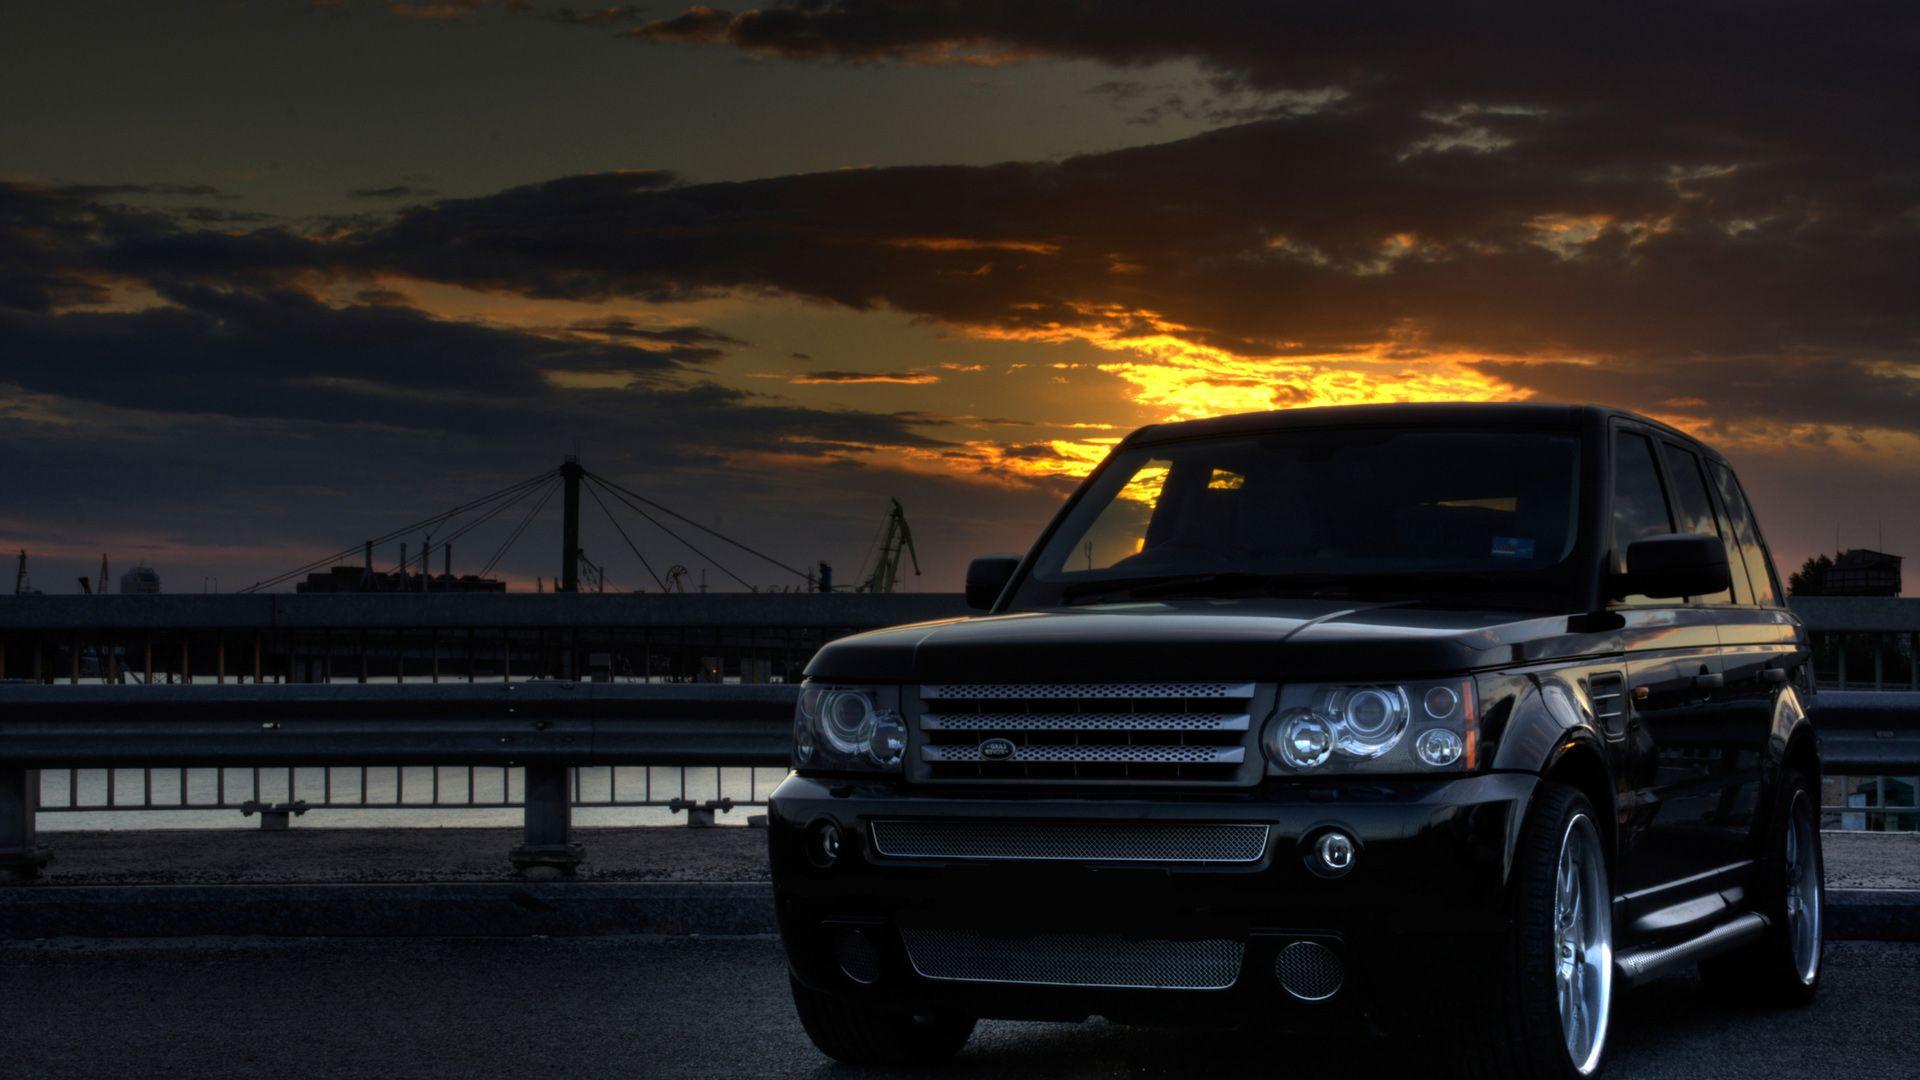 Range Rover good background